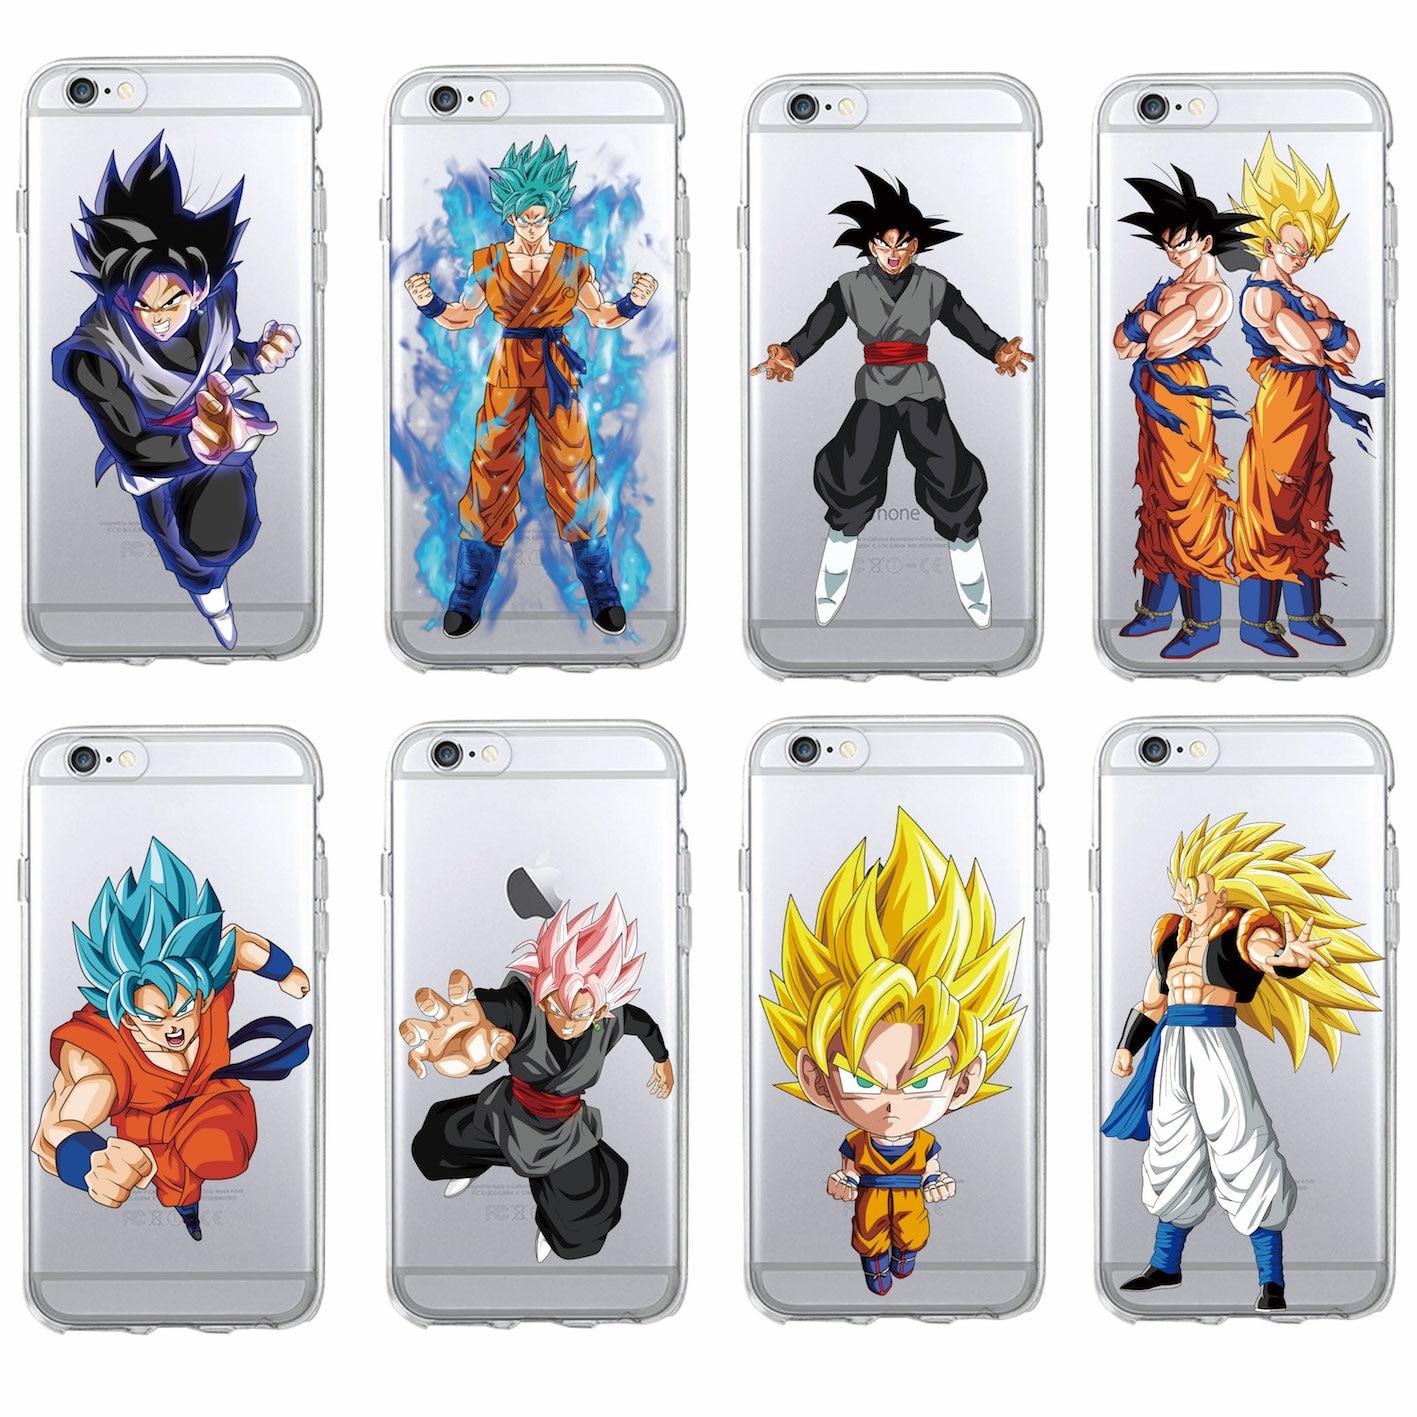 Dragon Ball Z Phone Case Iphone